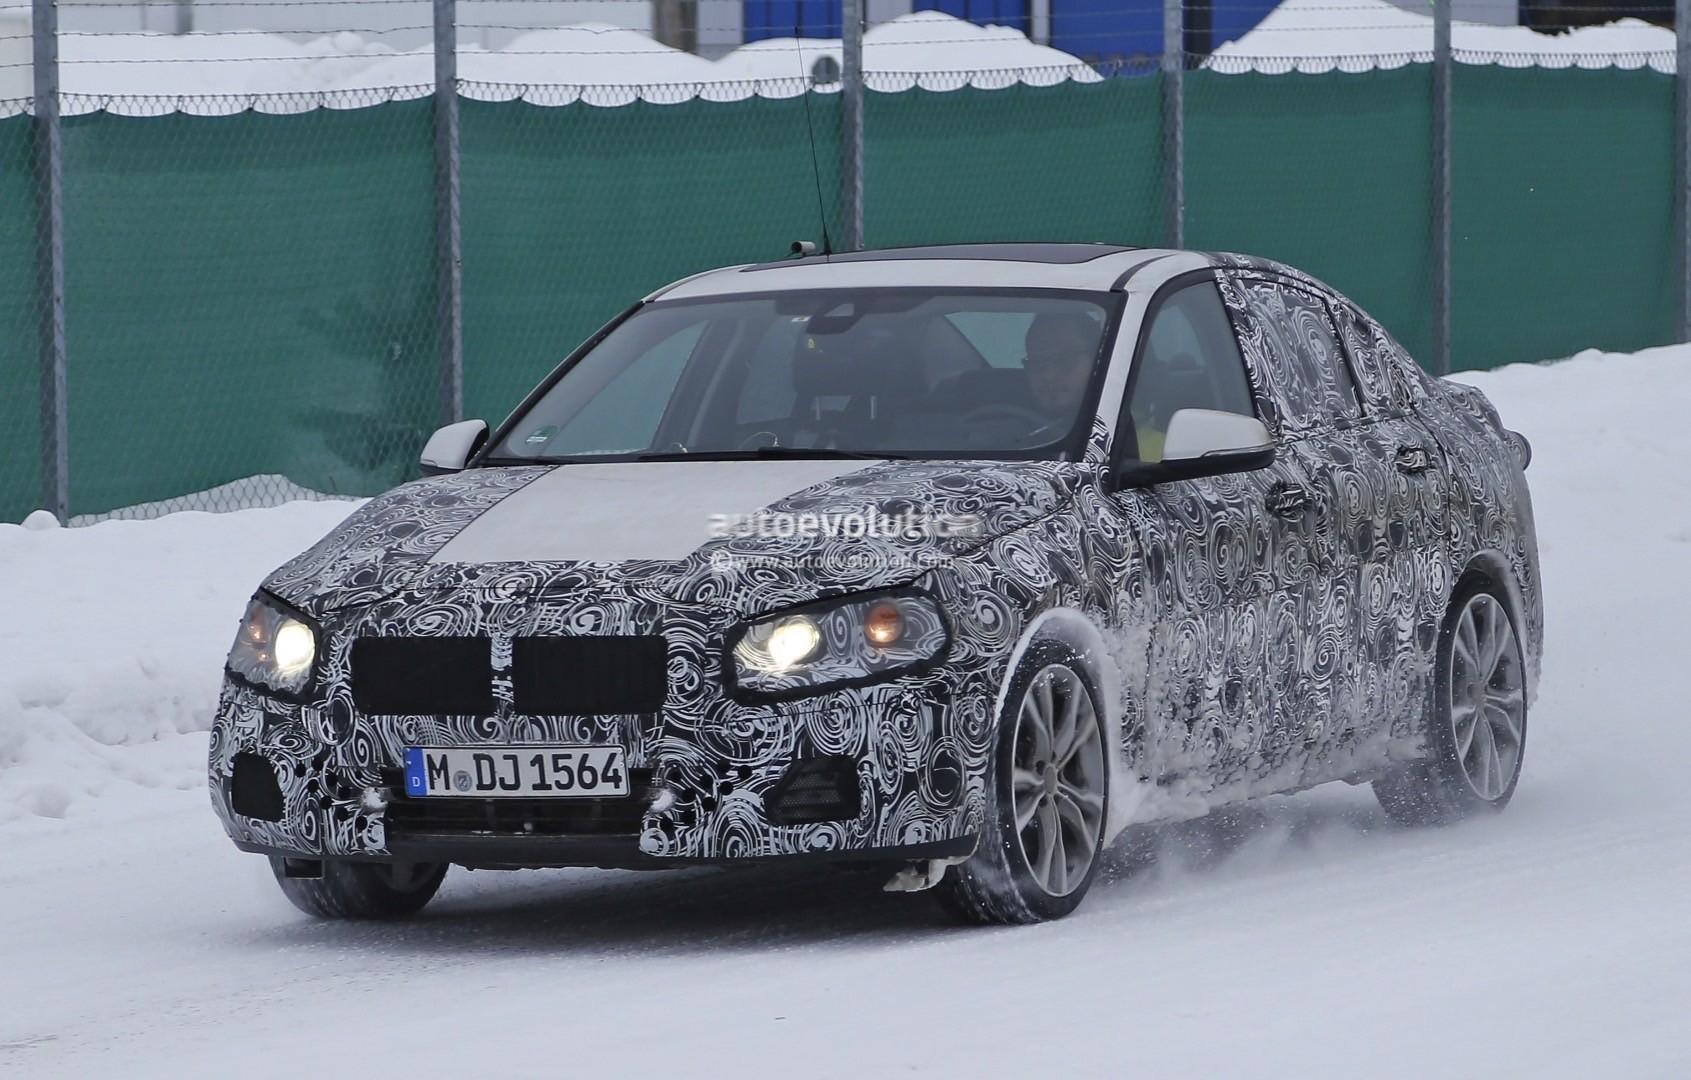 2016 - [BMW] Série 1 Sedan [F52] - Page 3 2016-bmw-f52-1-series-sedan-spotted-winter-testing-photo-gallery_1